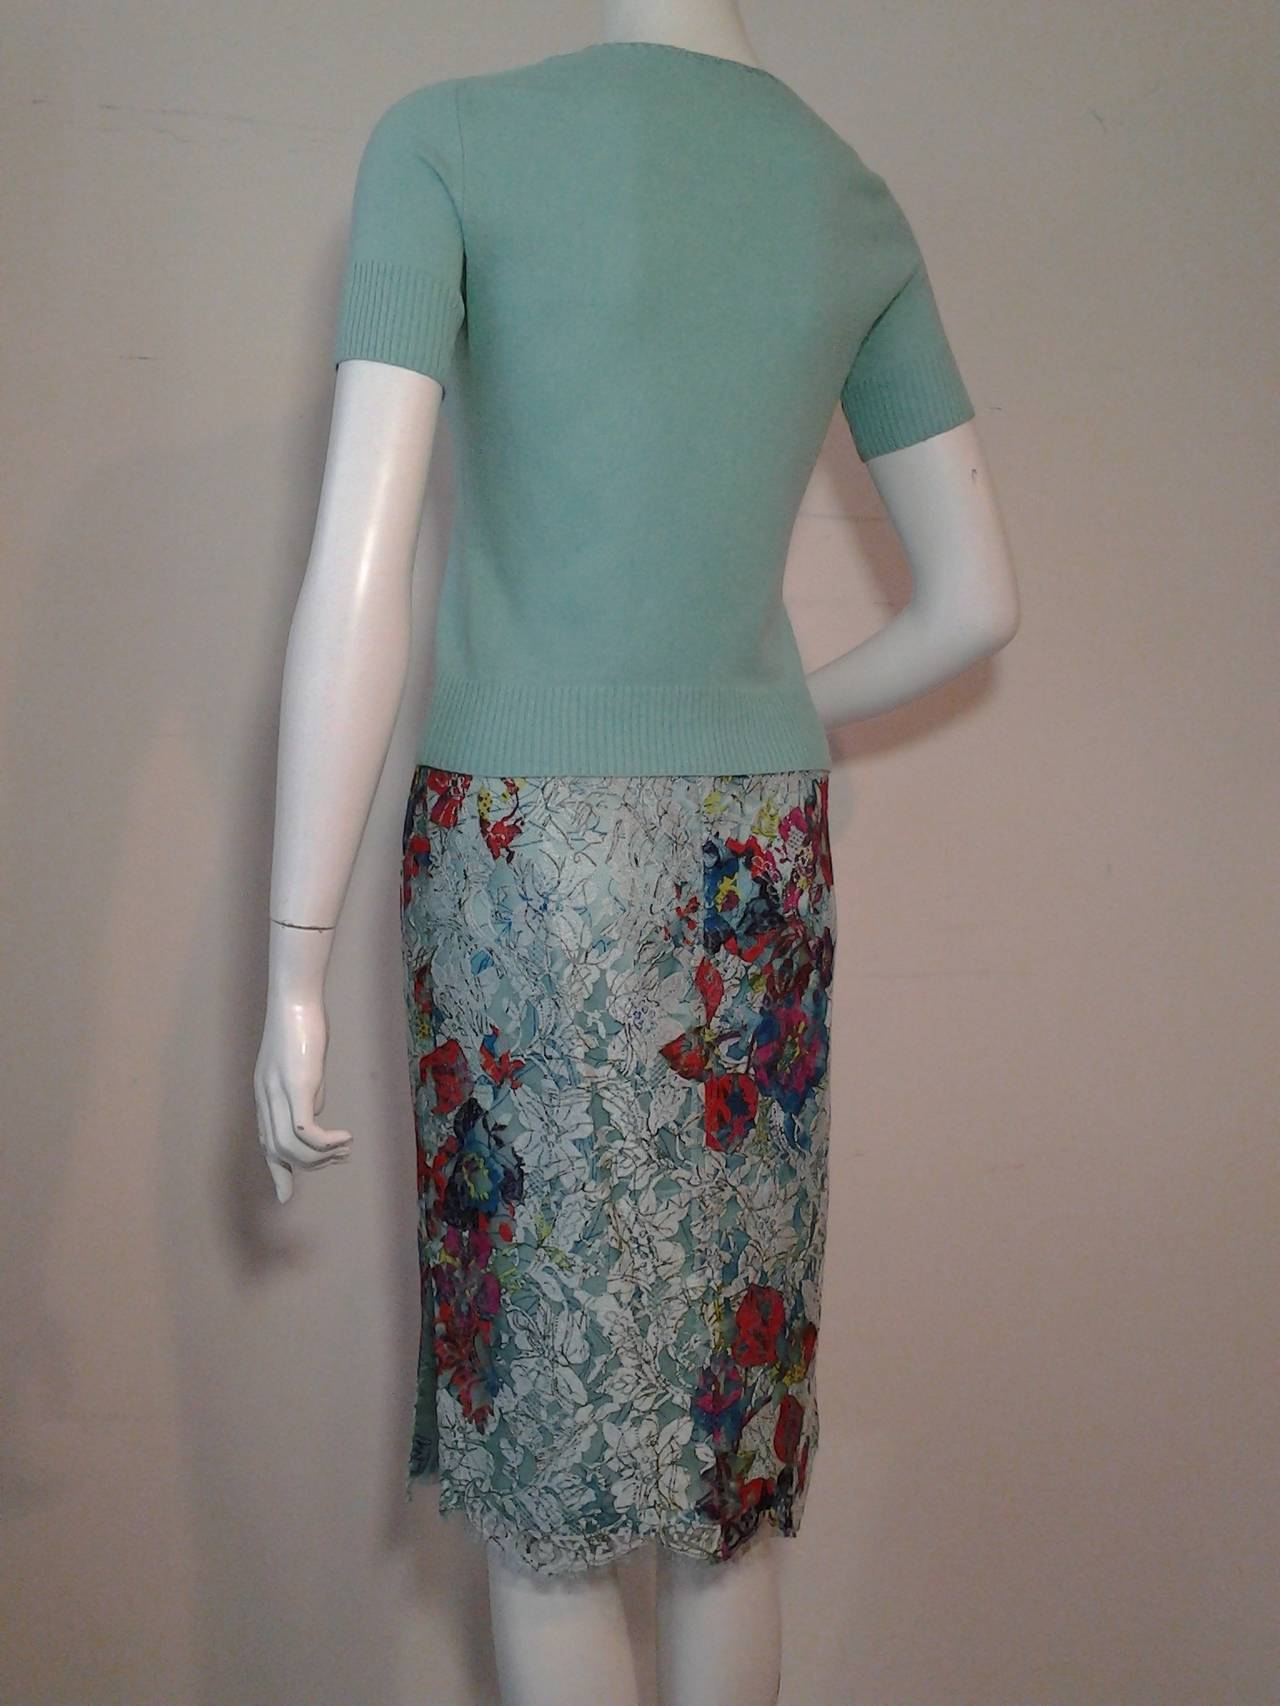 1990s Christian Lacroix Bazaar 2-Piece Sweater and Lace Skirt Ensemble 5